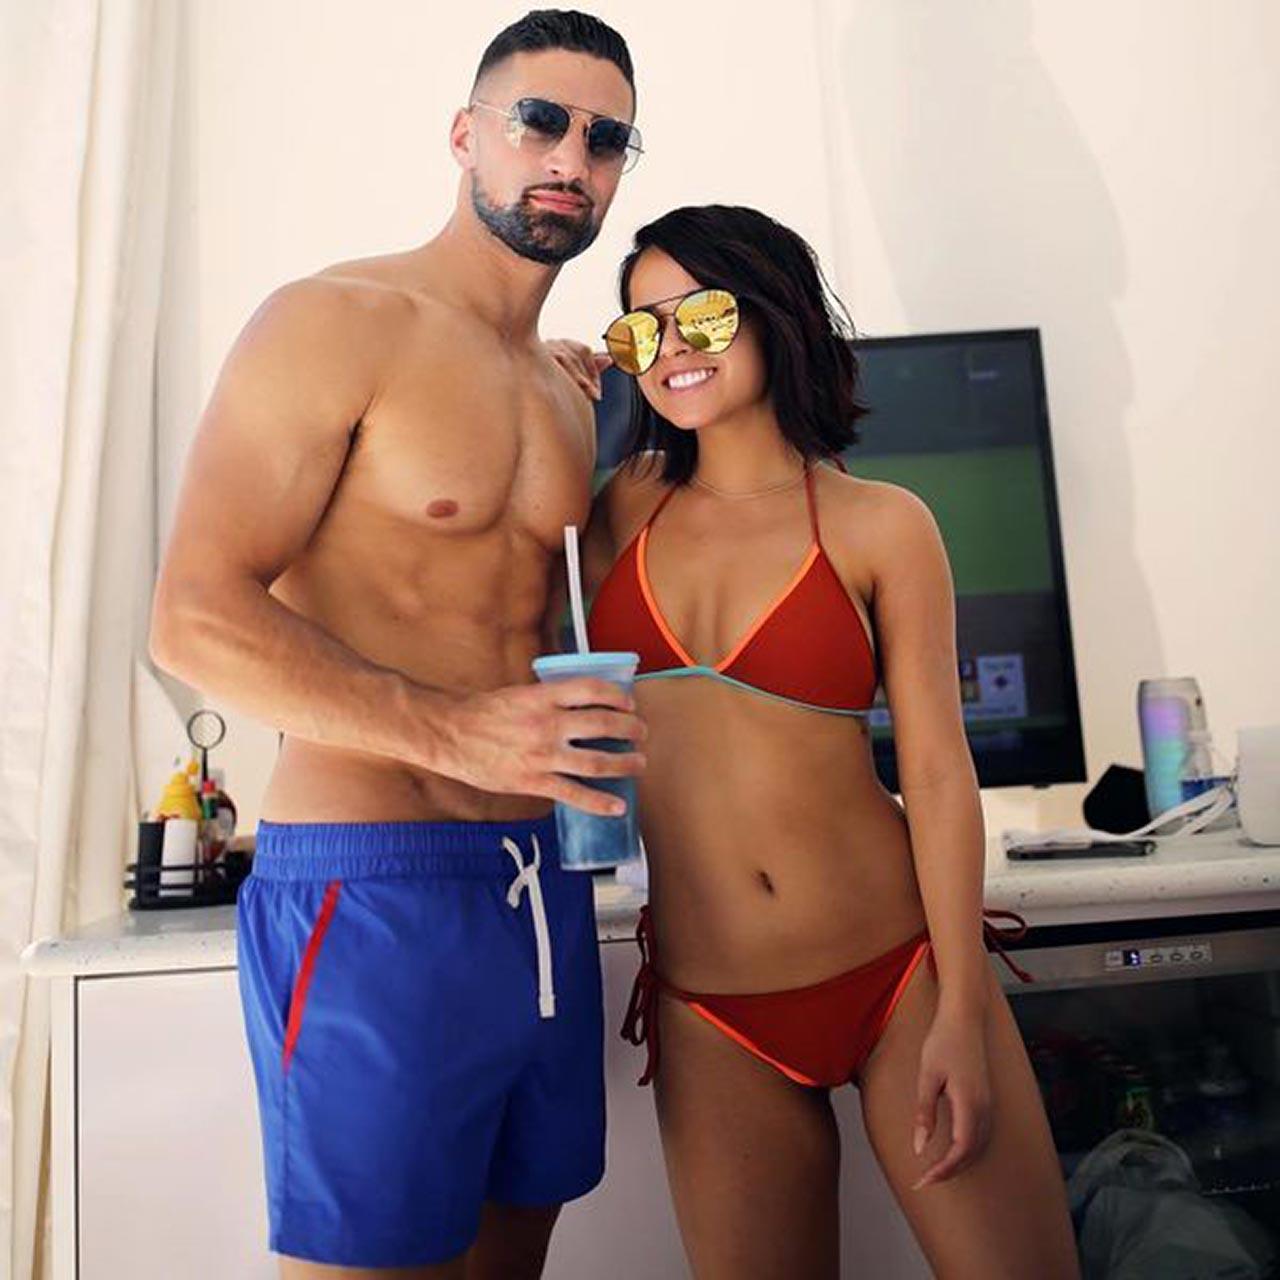 Becky g bikini photos. Becky G Nude Photos Leaked Online